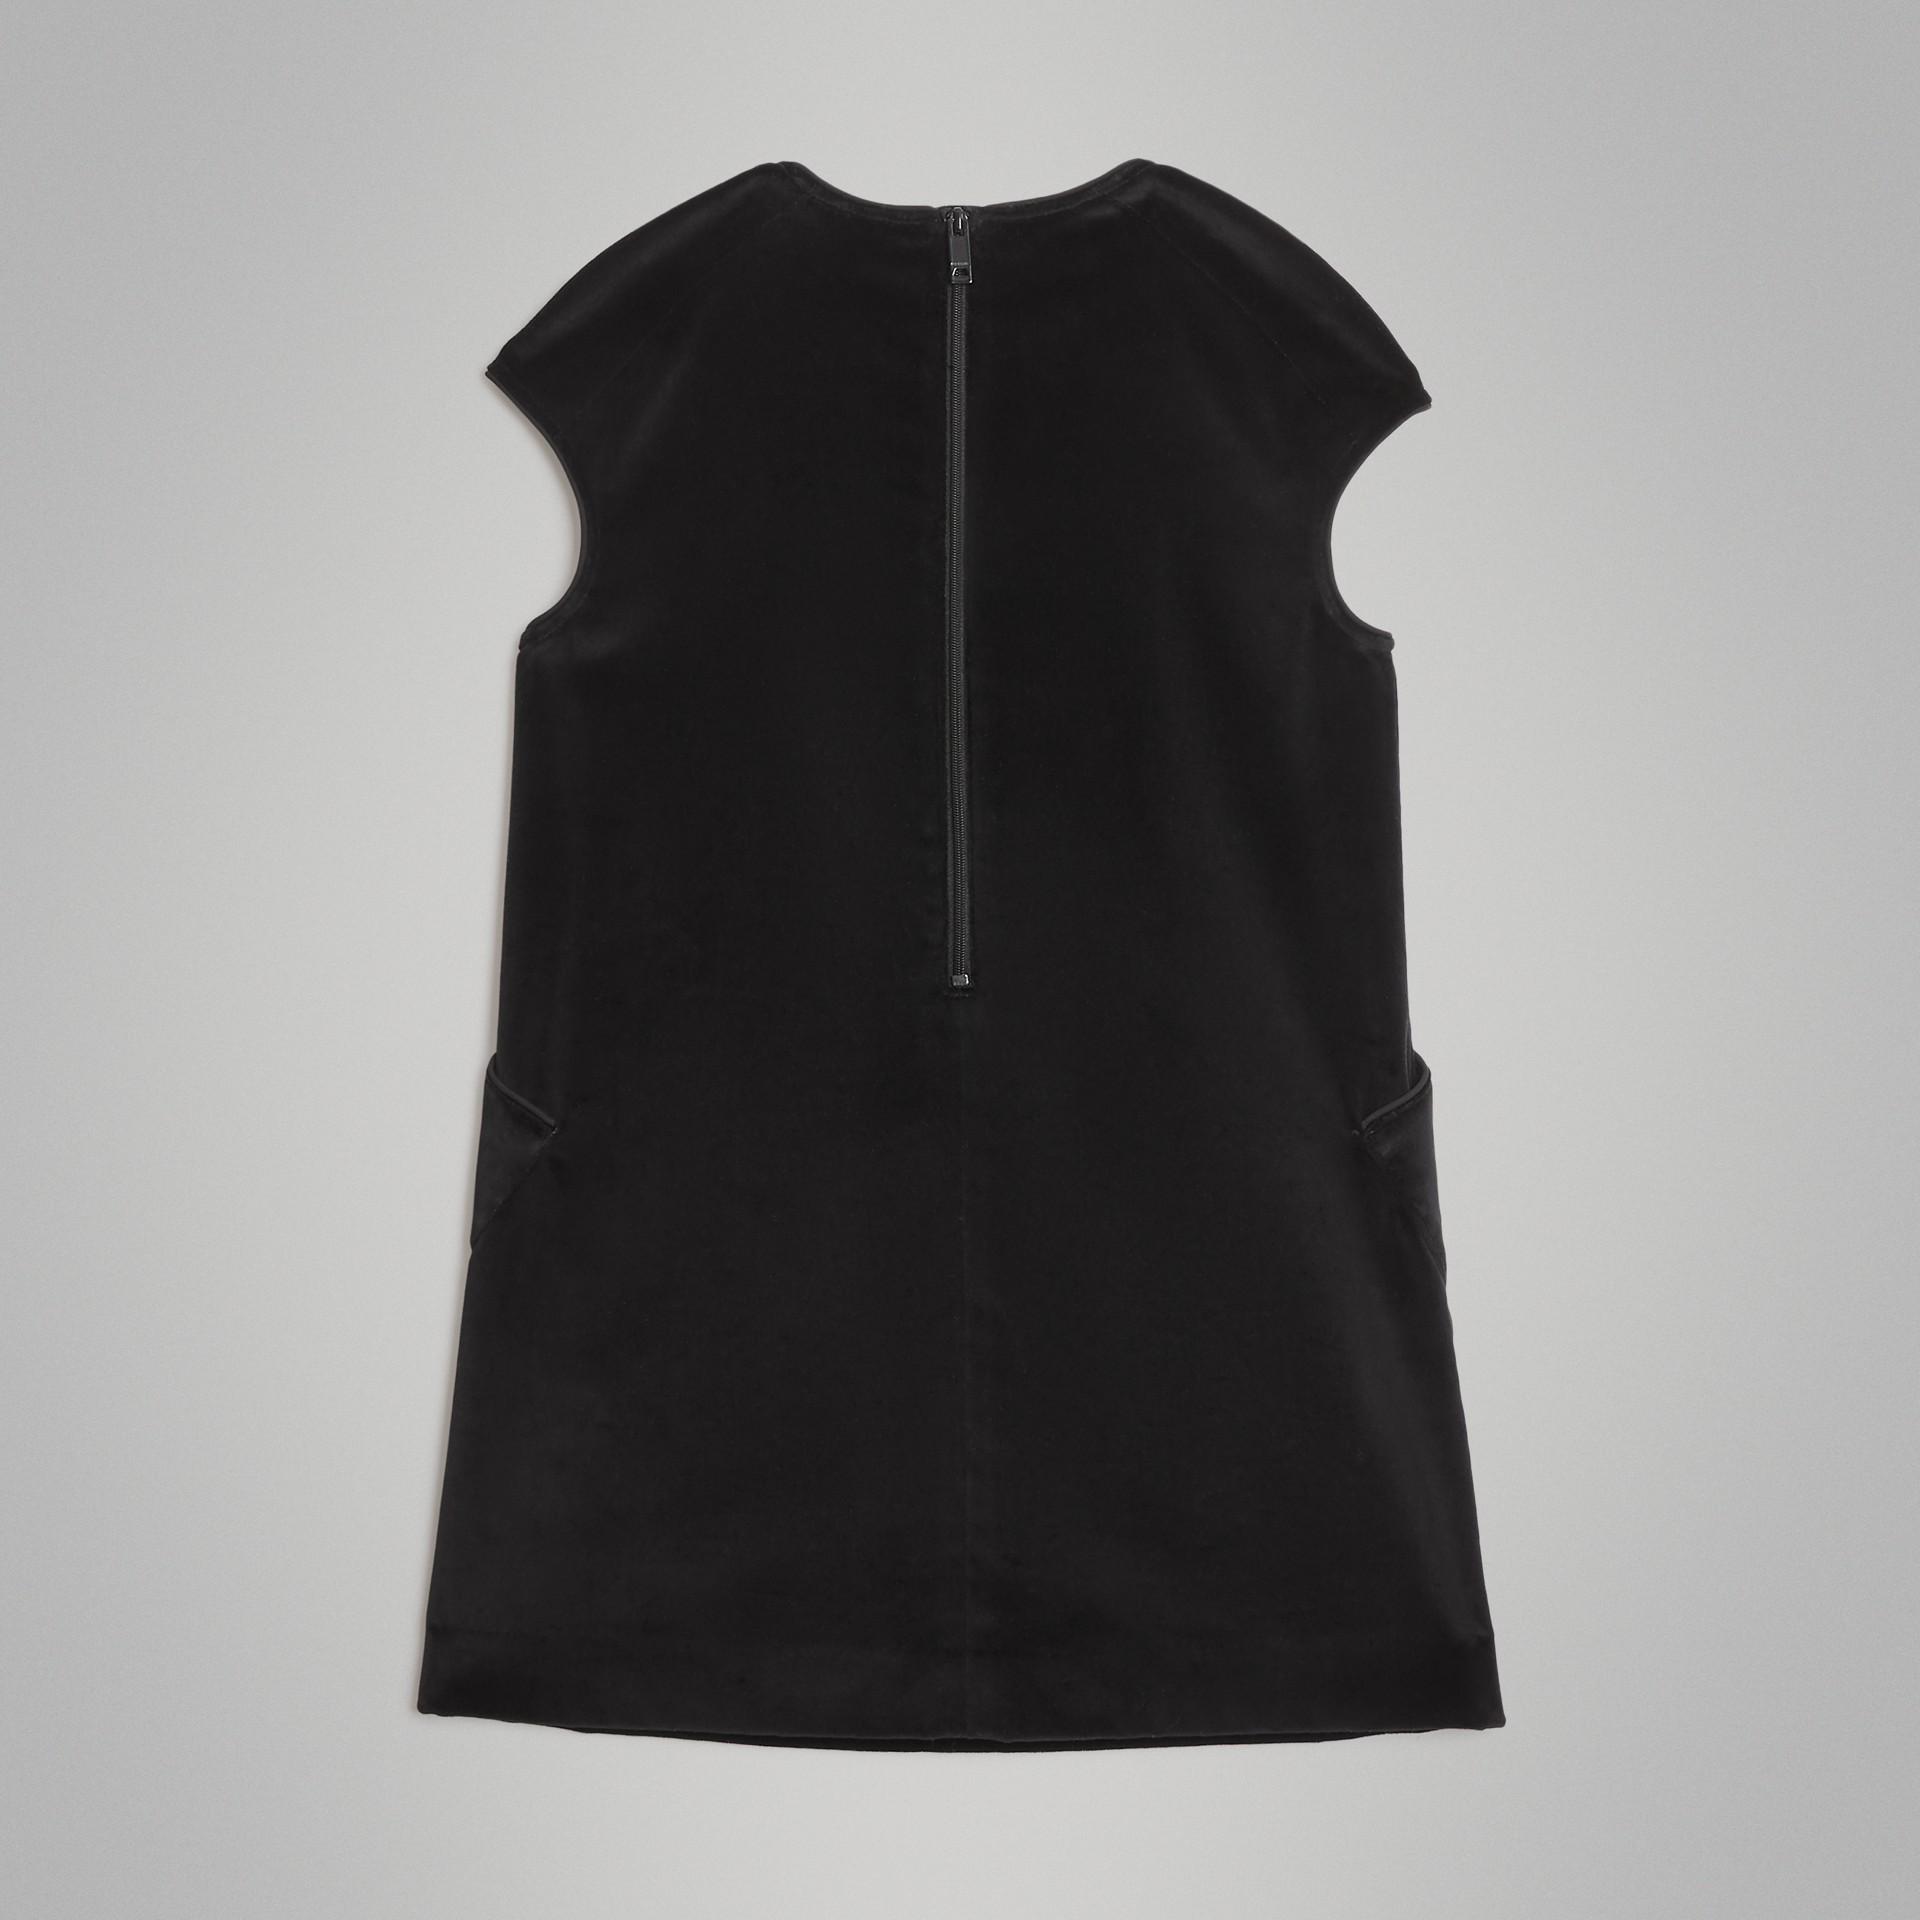 Piping Detail Velvet Shift Dress in Black | Burberry United States - gallery image 3